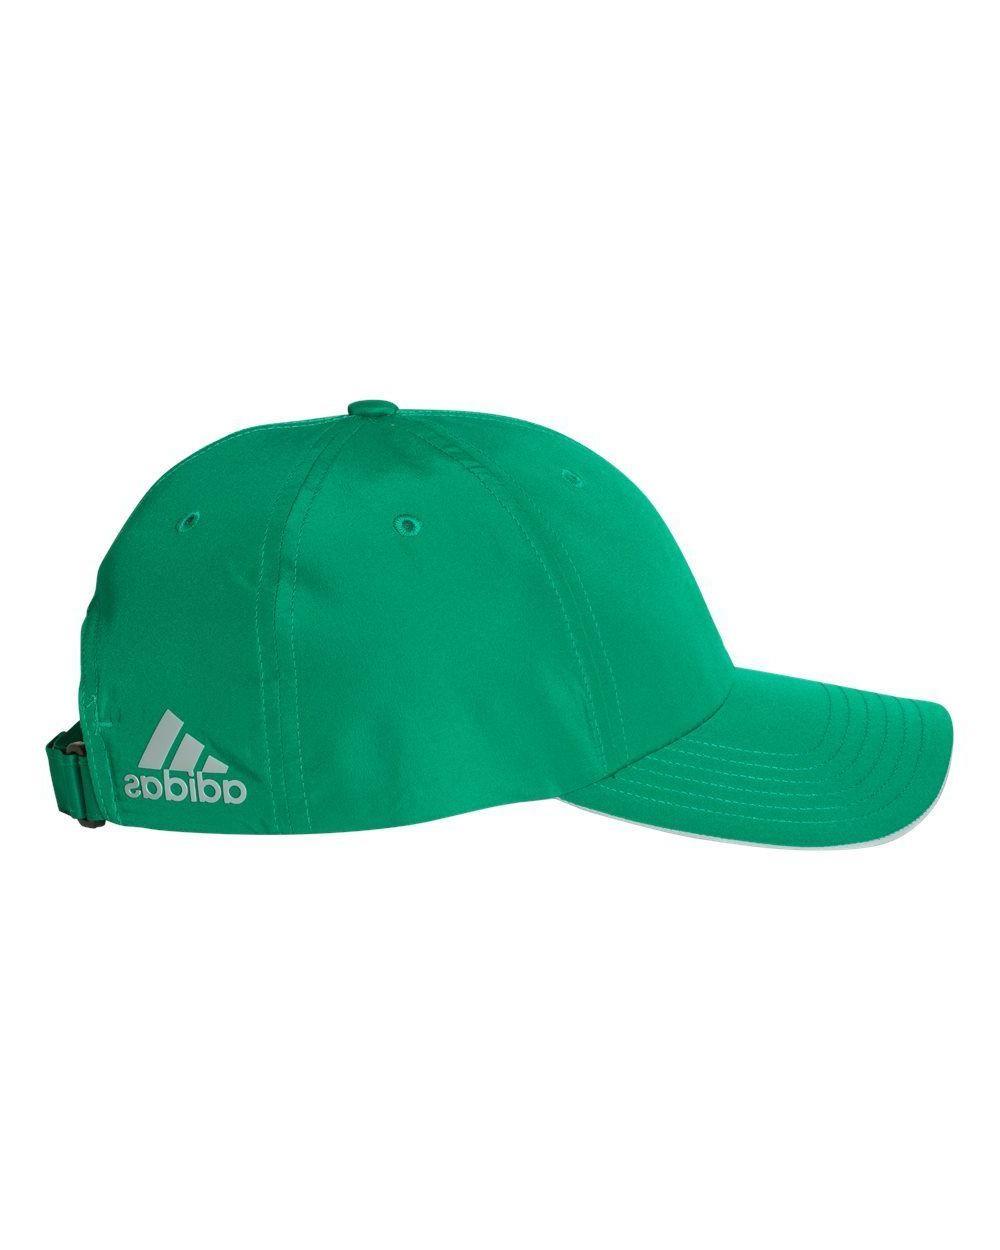 ADIDAS HAT, NEW Performance Cap